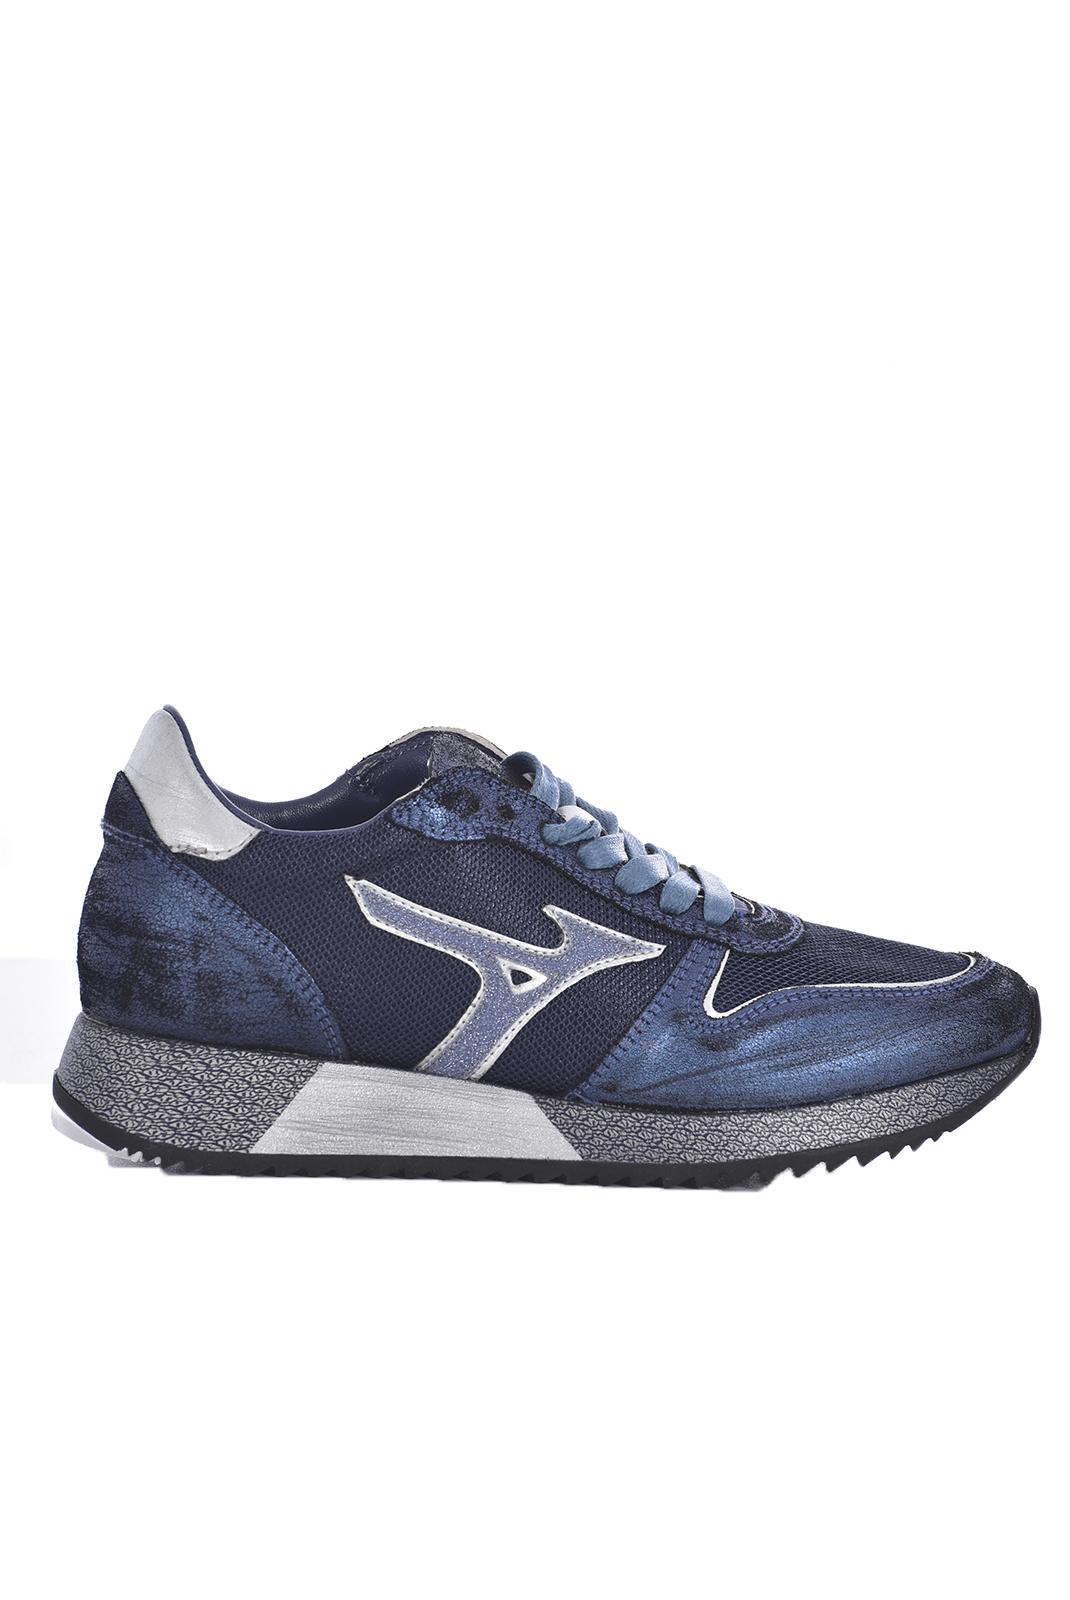 Baskets / Sneakers  Mizuno D1GE181127 ETAMIN 2  ETAMIN 2LI WOS BLUE/BLUE/B